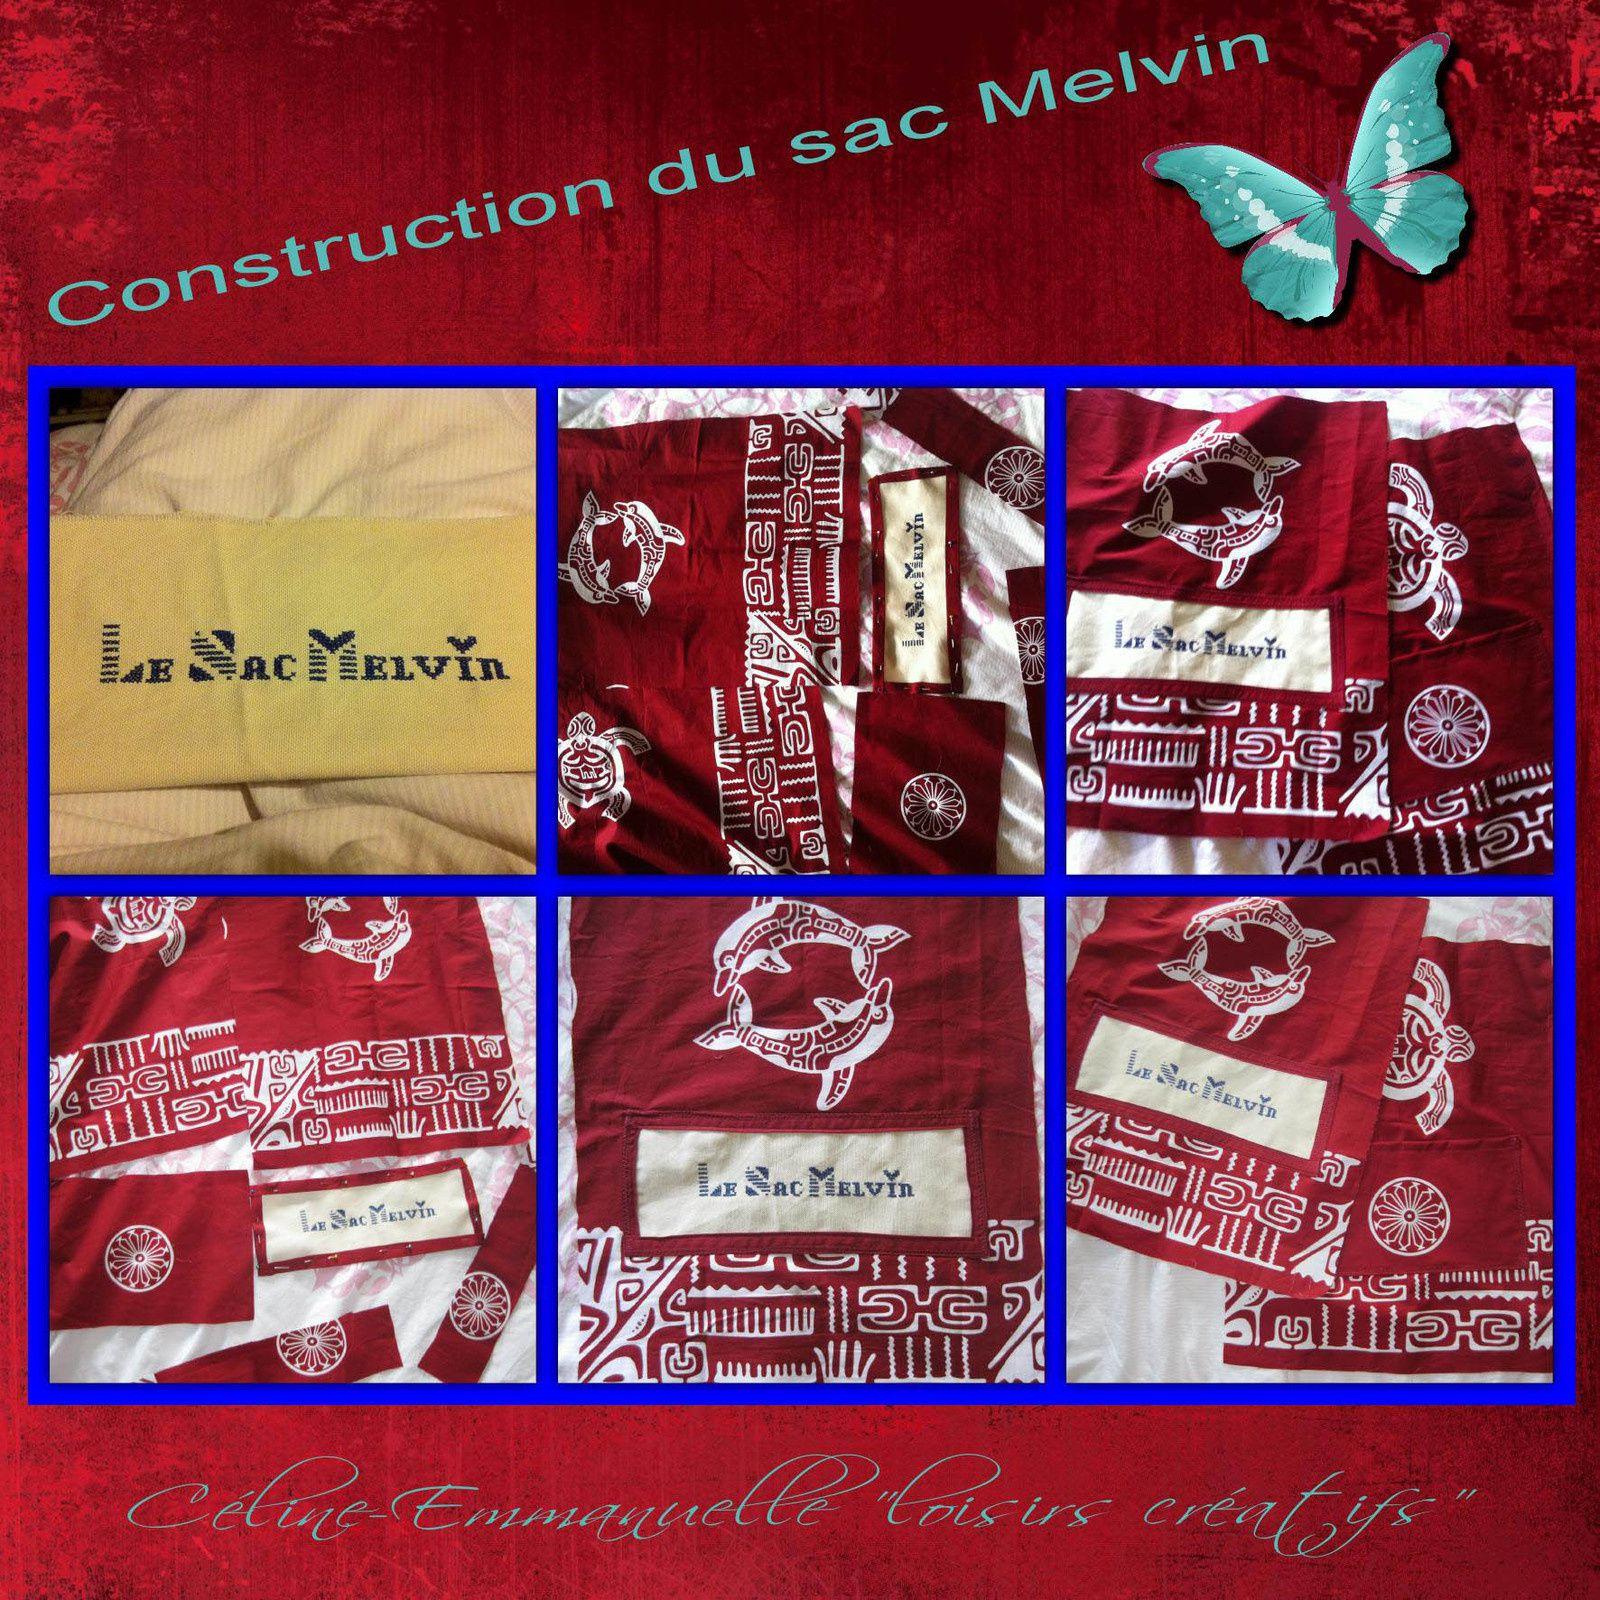 N°248 Le sac Melvin